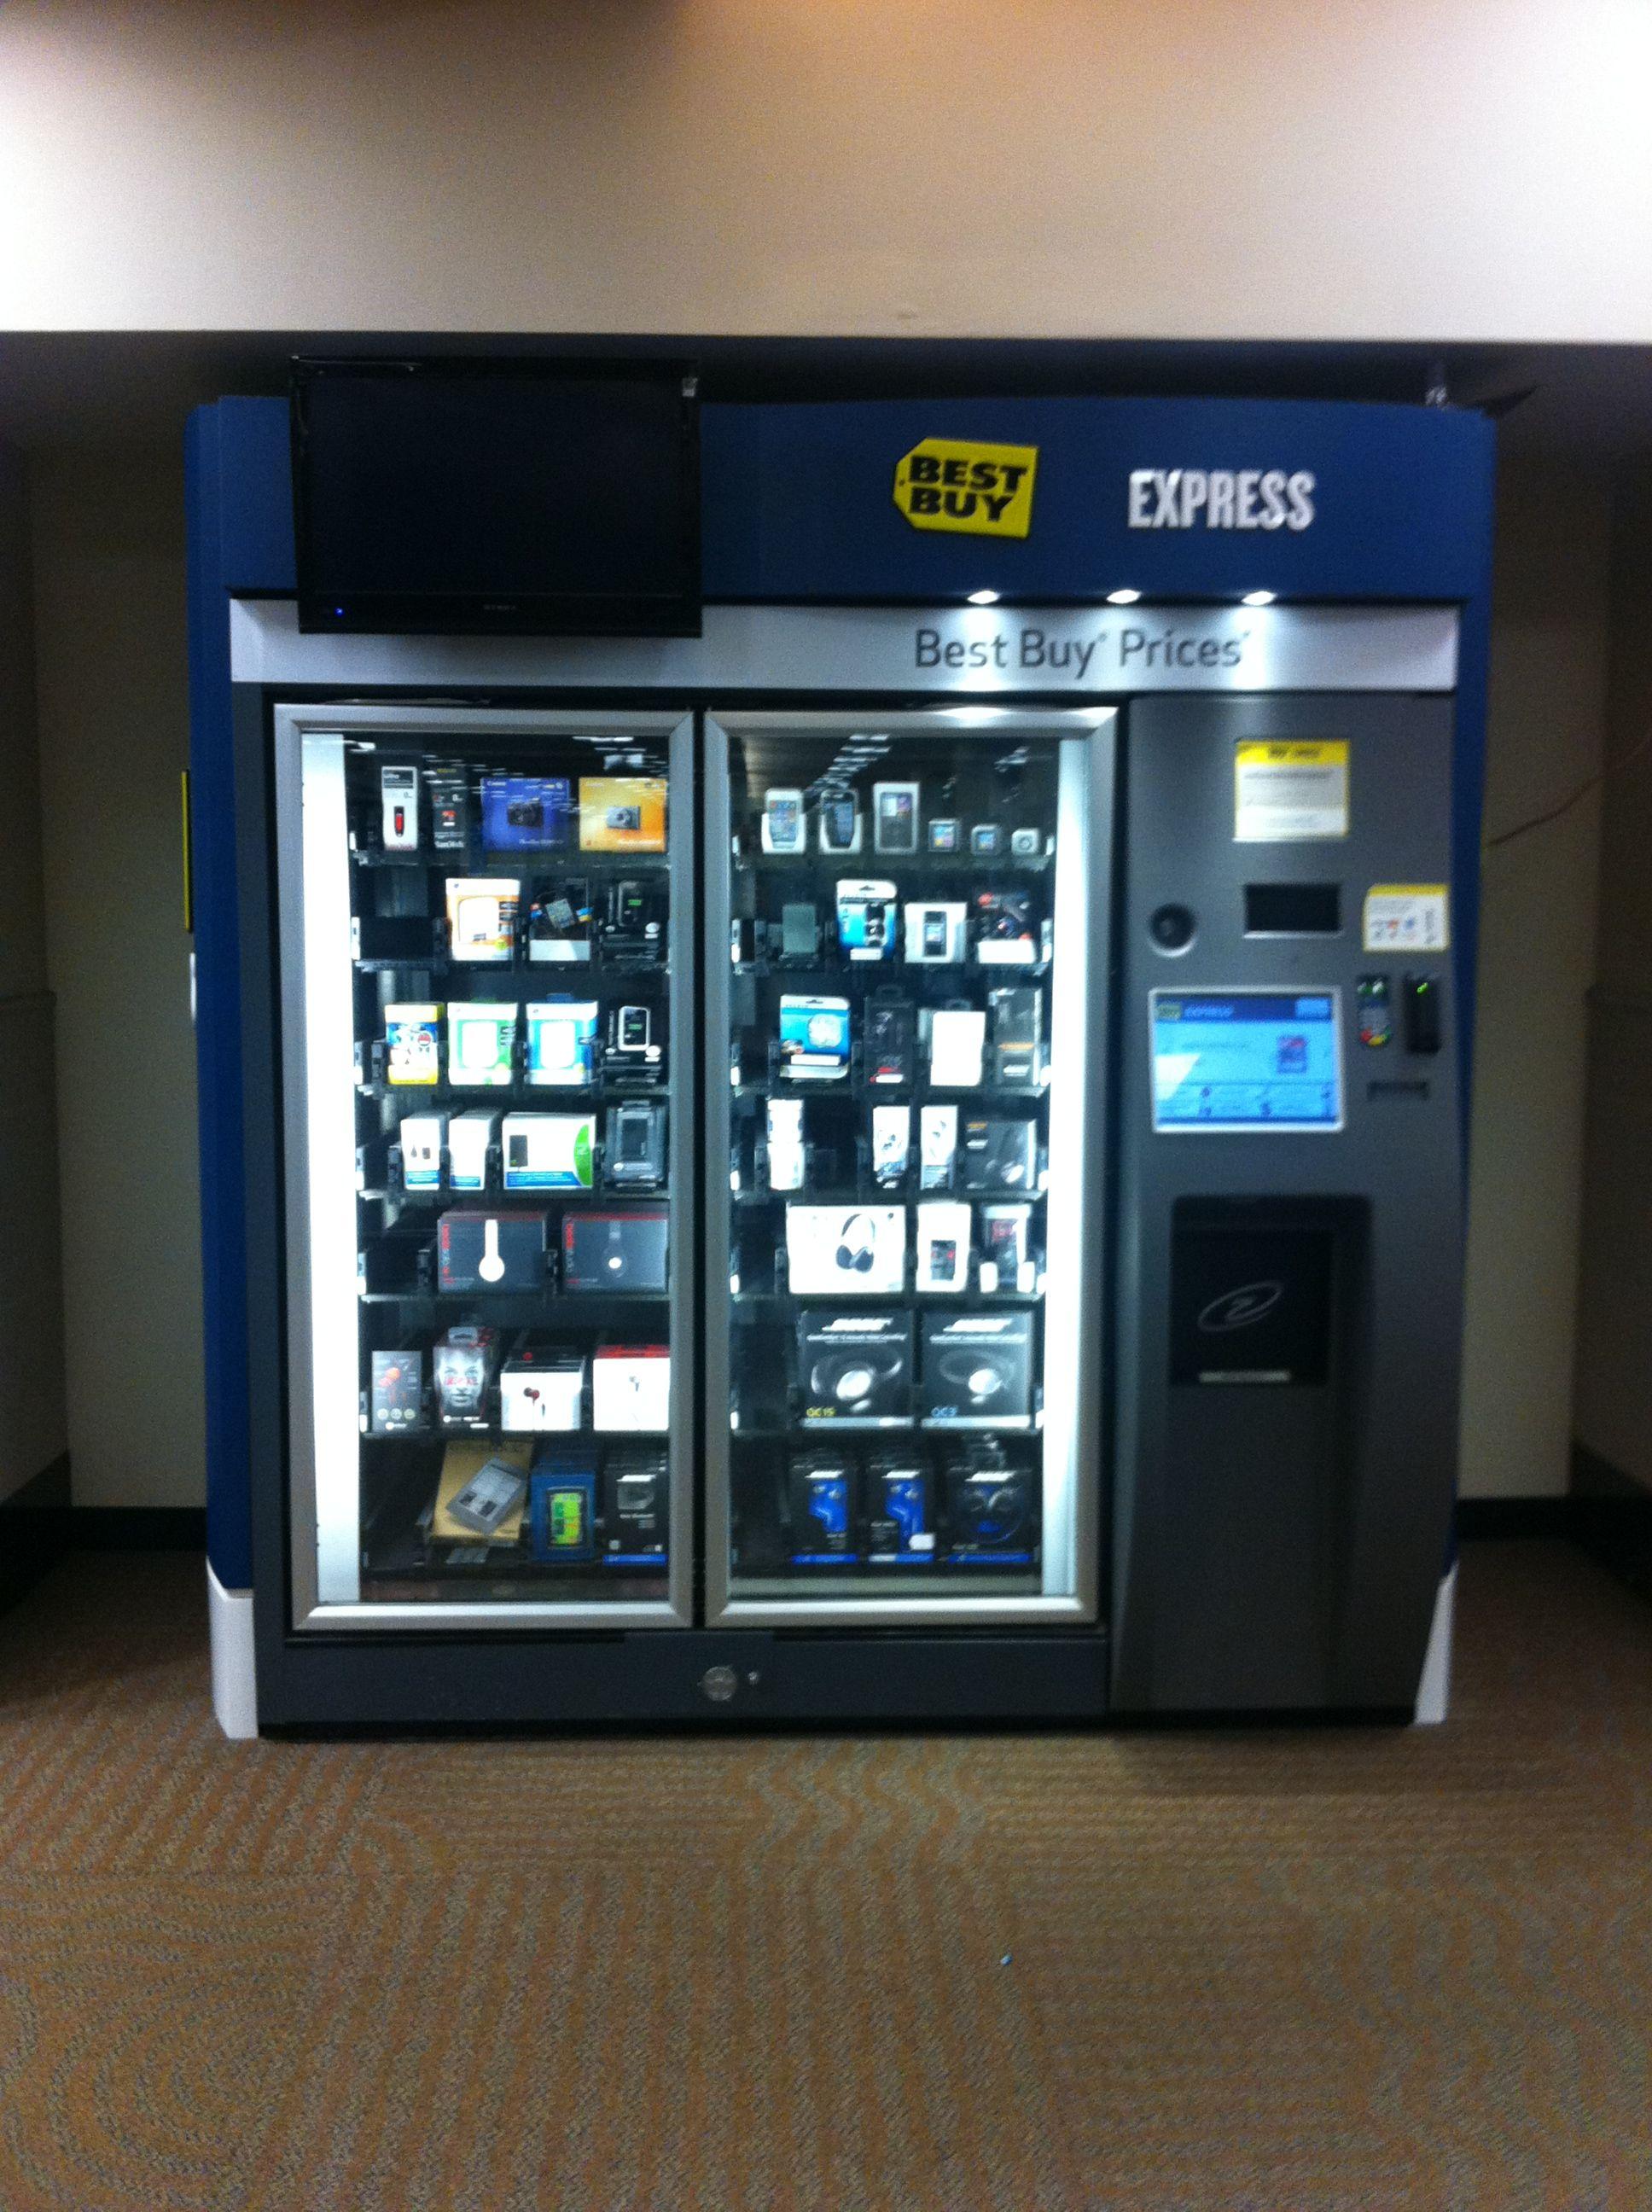 Best Buy Tech Vending Machine Minneapolis Airport Cool Things To Buy Vending Machine Stuff To Buy